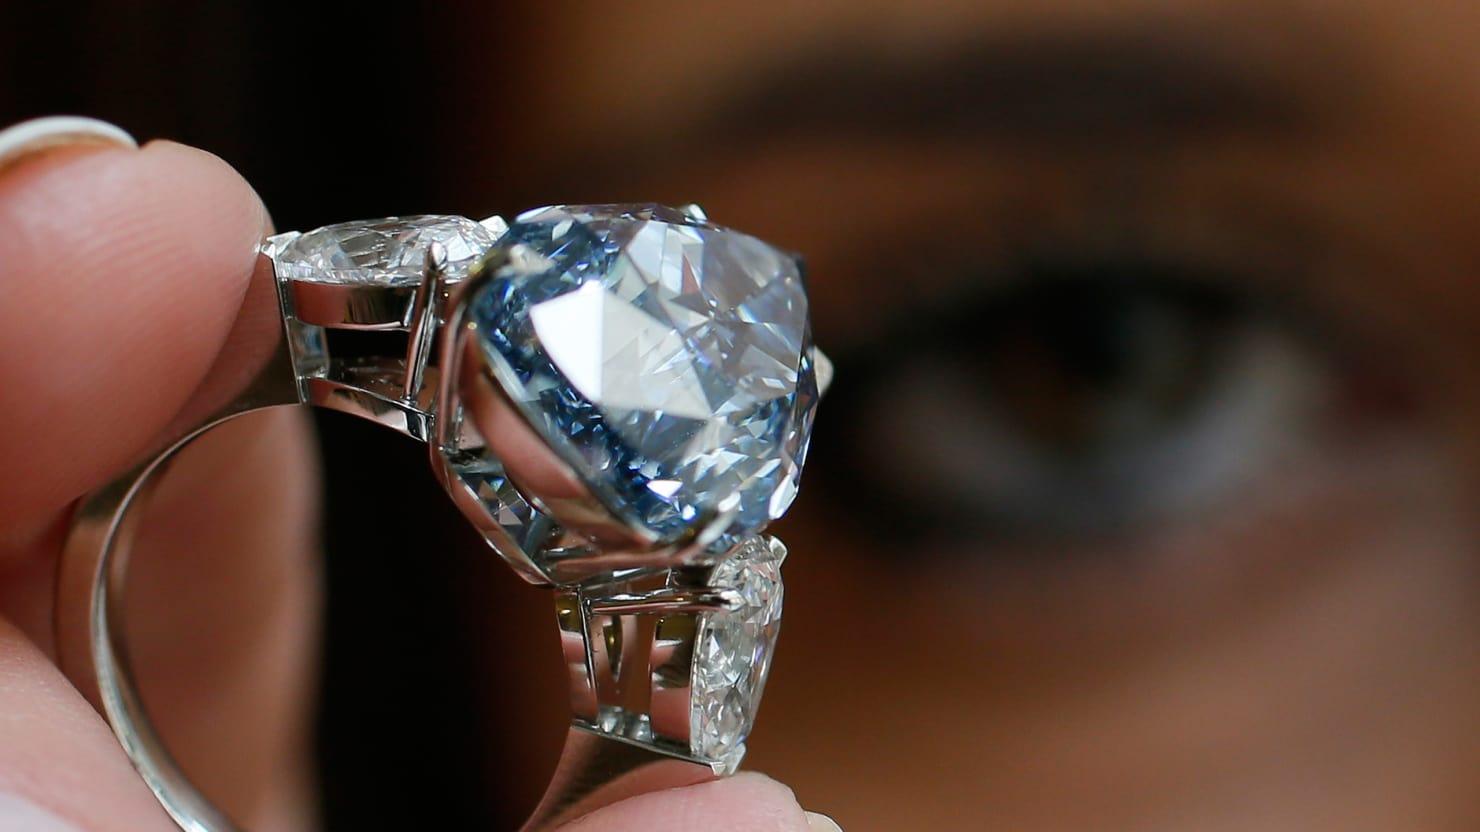 https: img-k.okeinfo.net content 2018 05 25 194 1902586 tips-rawat-perhiasan-berlian-biar-tetap-kinclong-qxsJZnw0He.jpg